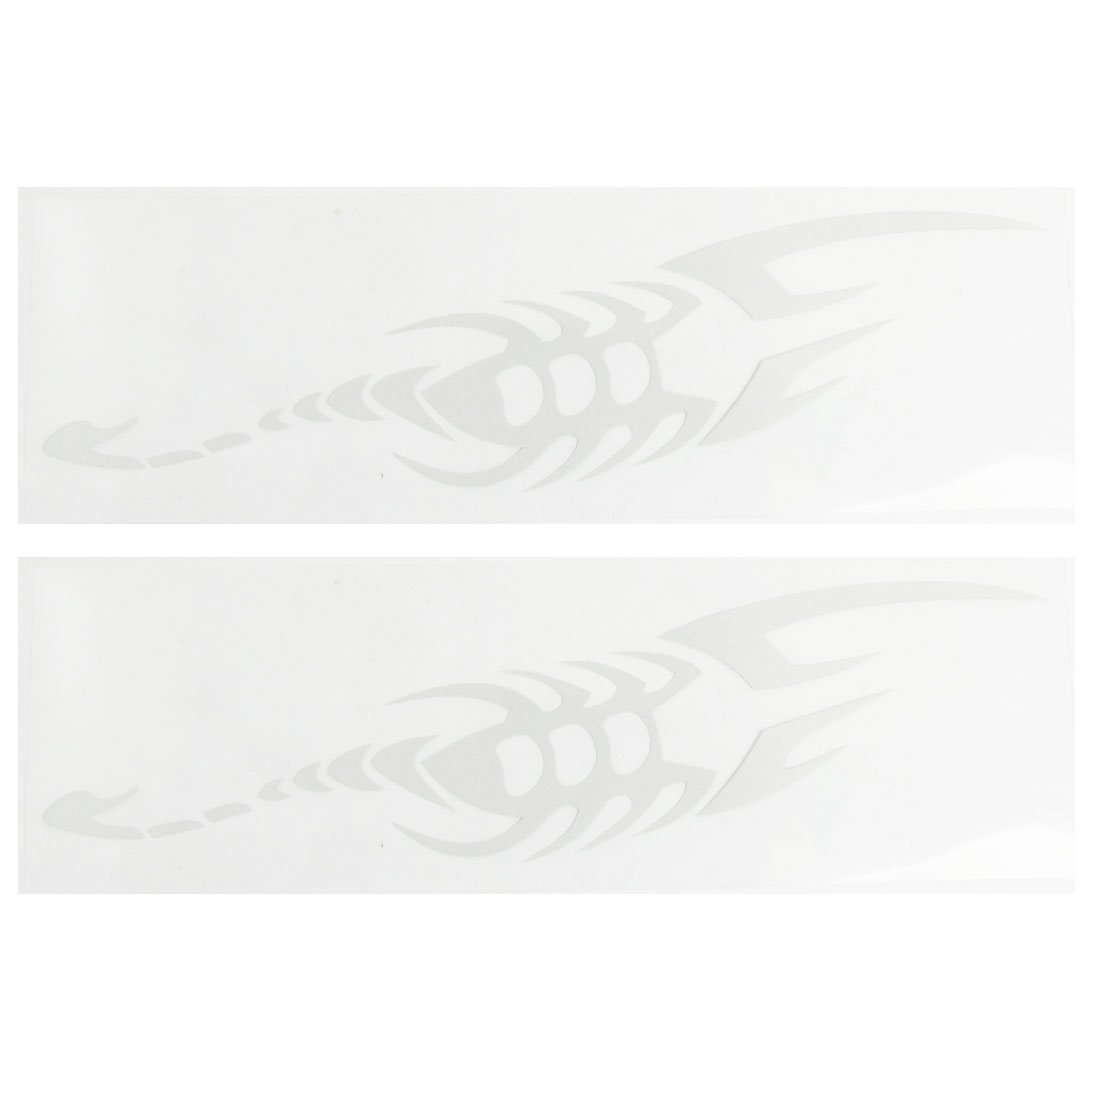 Auto Car 2 Pcs White Plastic Scorpion Shape Reflective Stickers